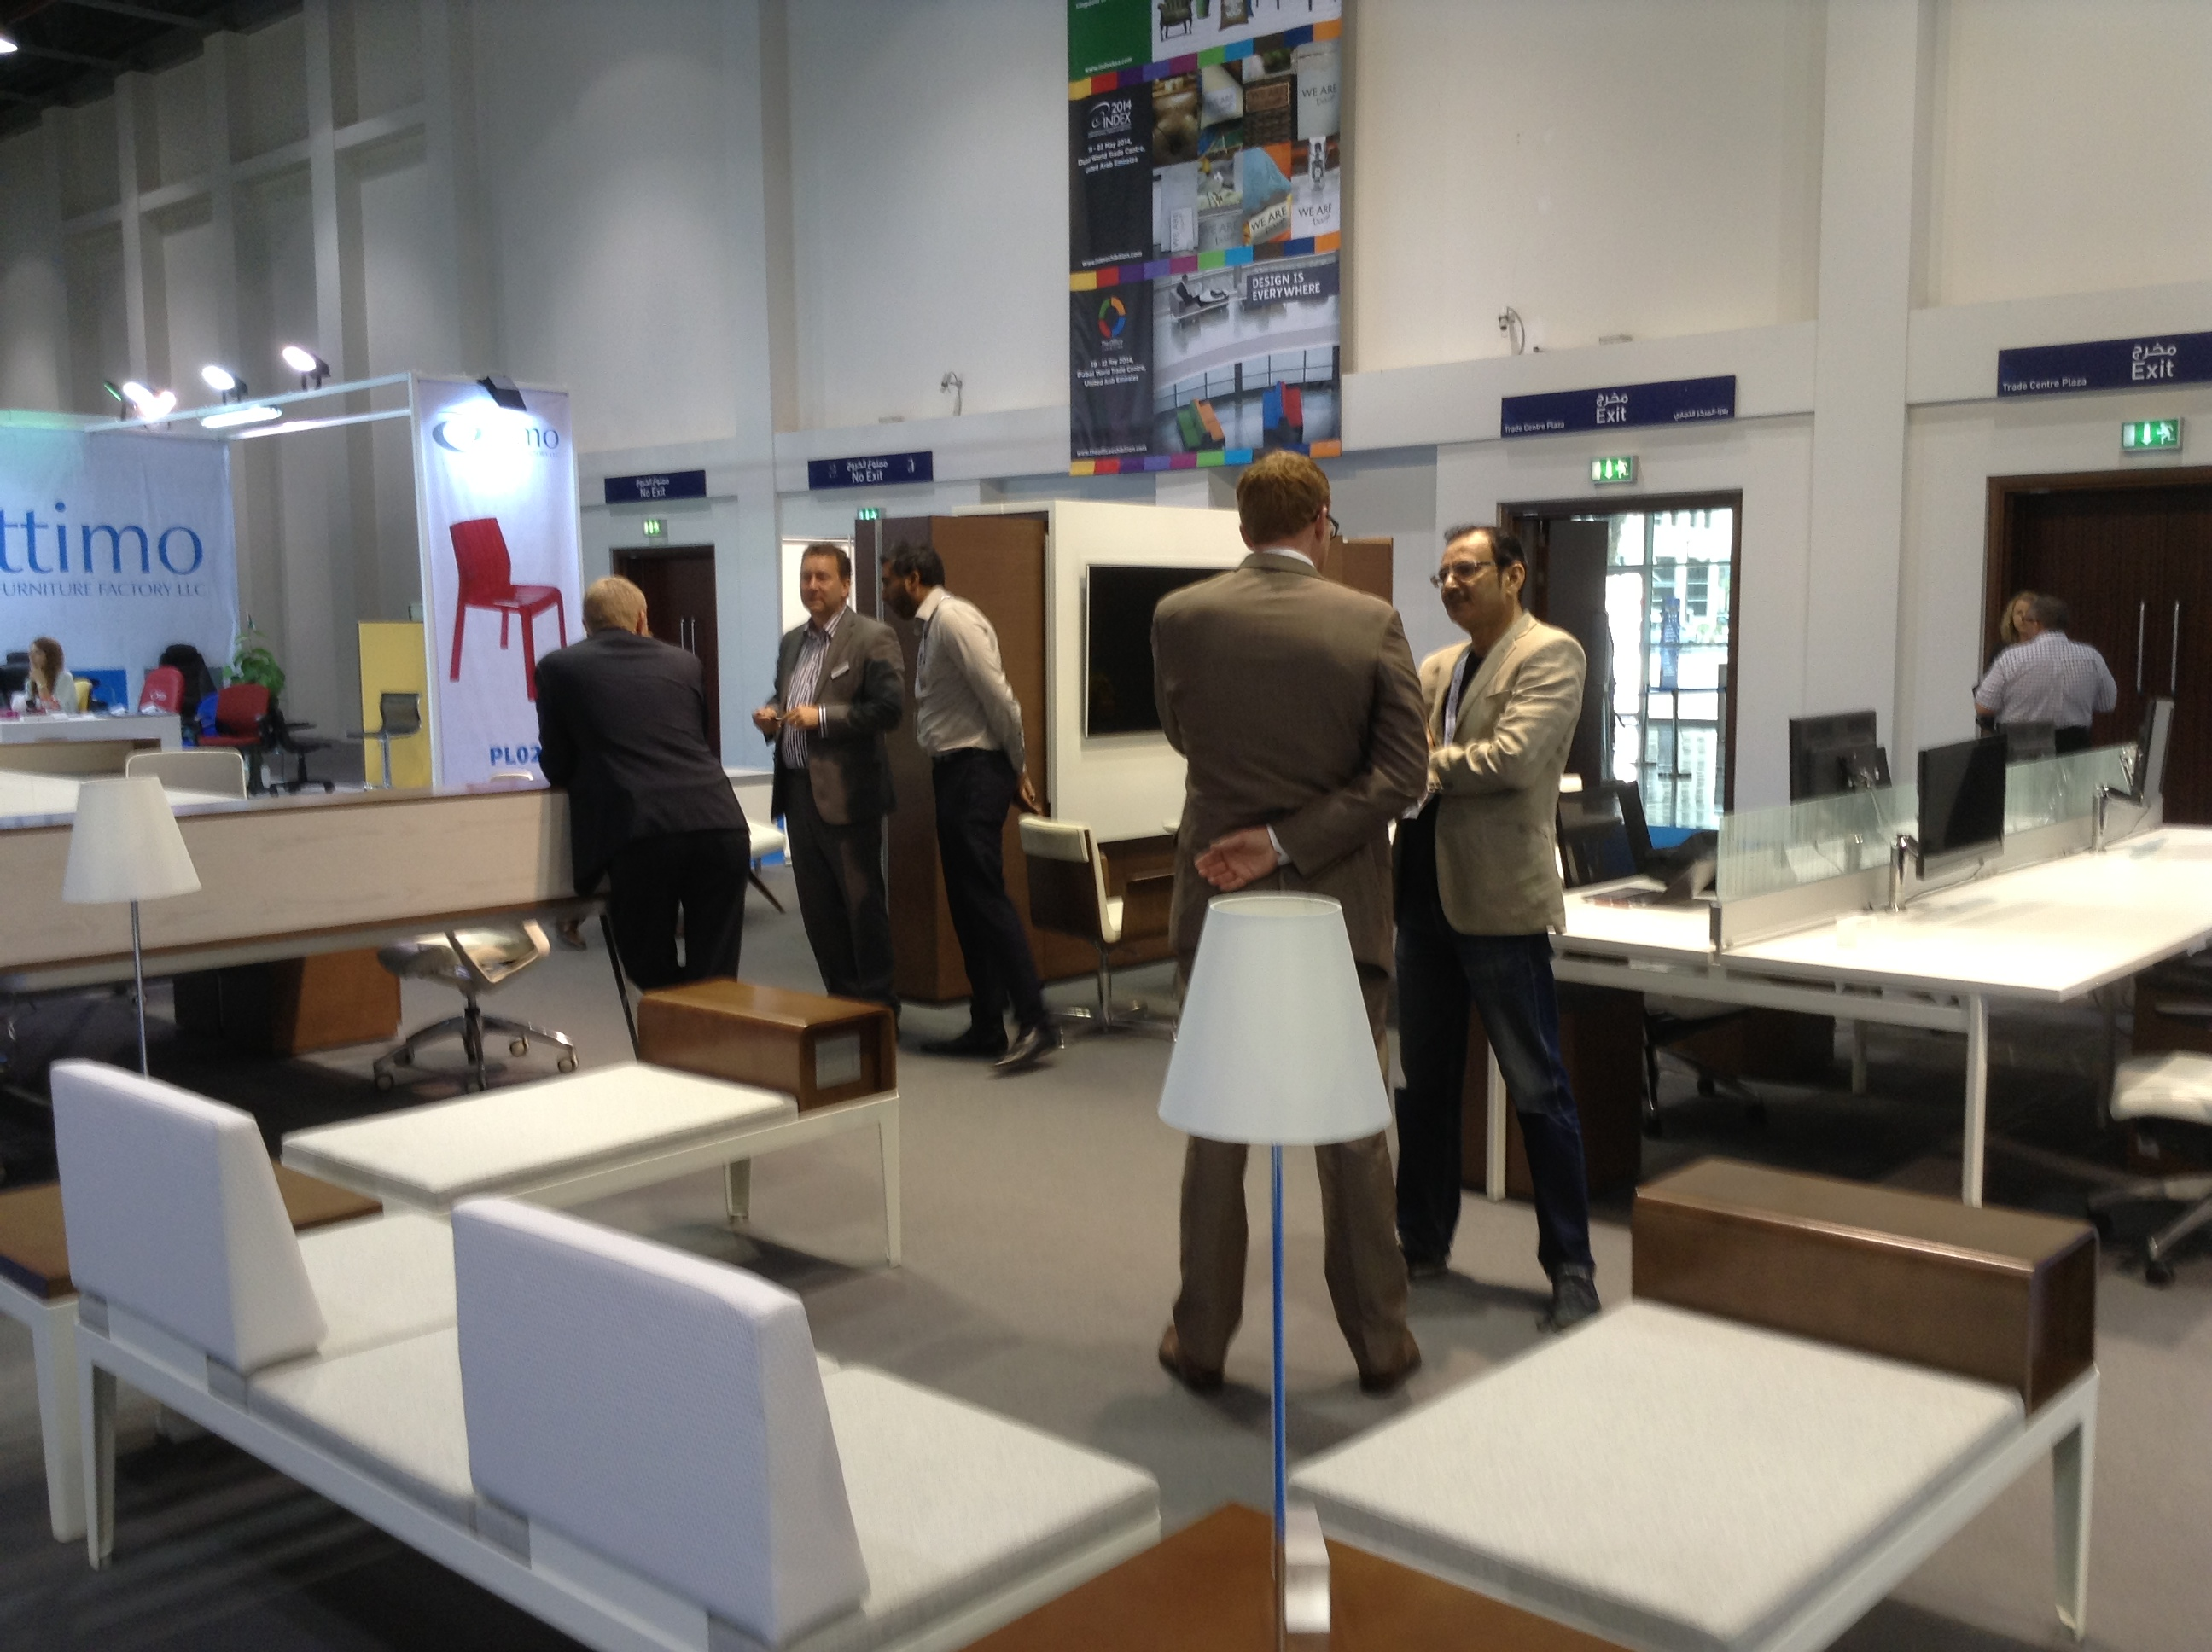 of the Campus at the fice Exhibition Index Dubai 2013